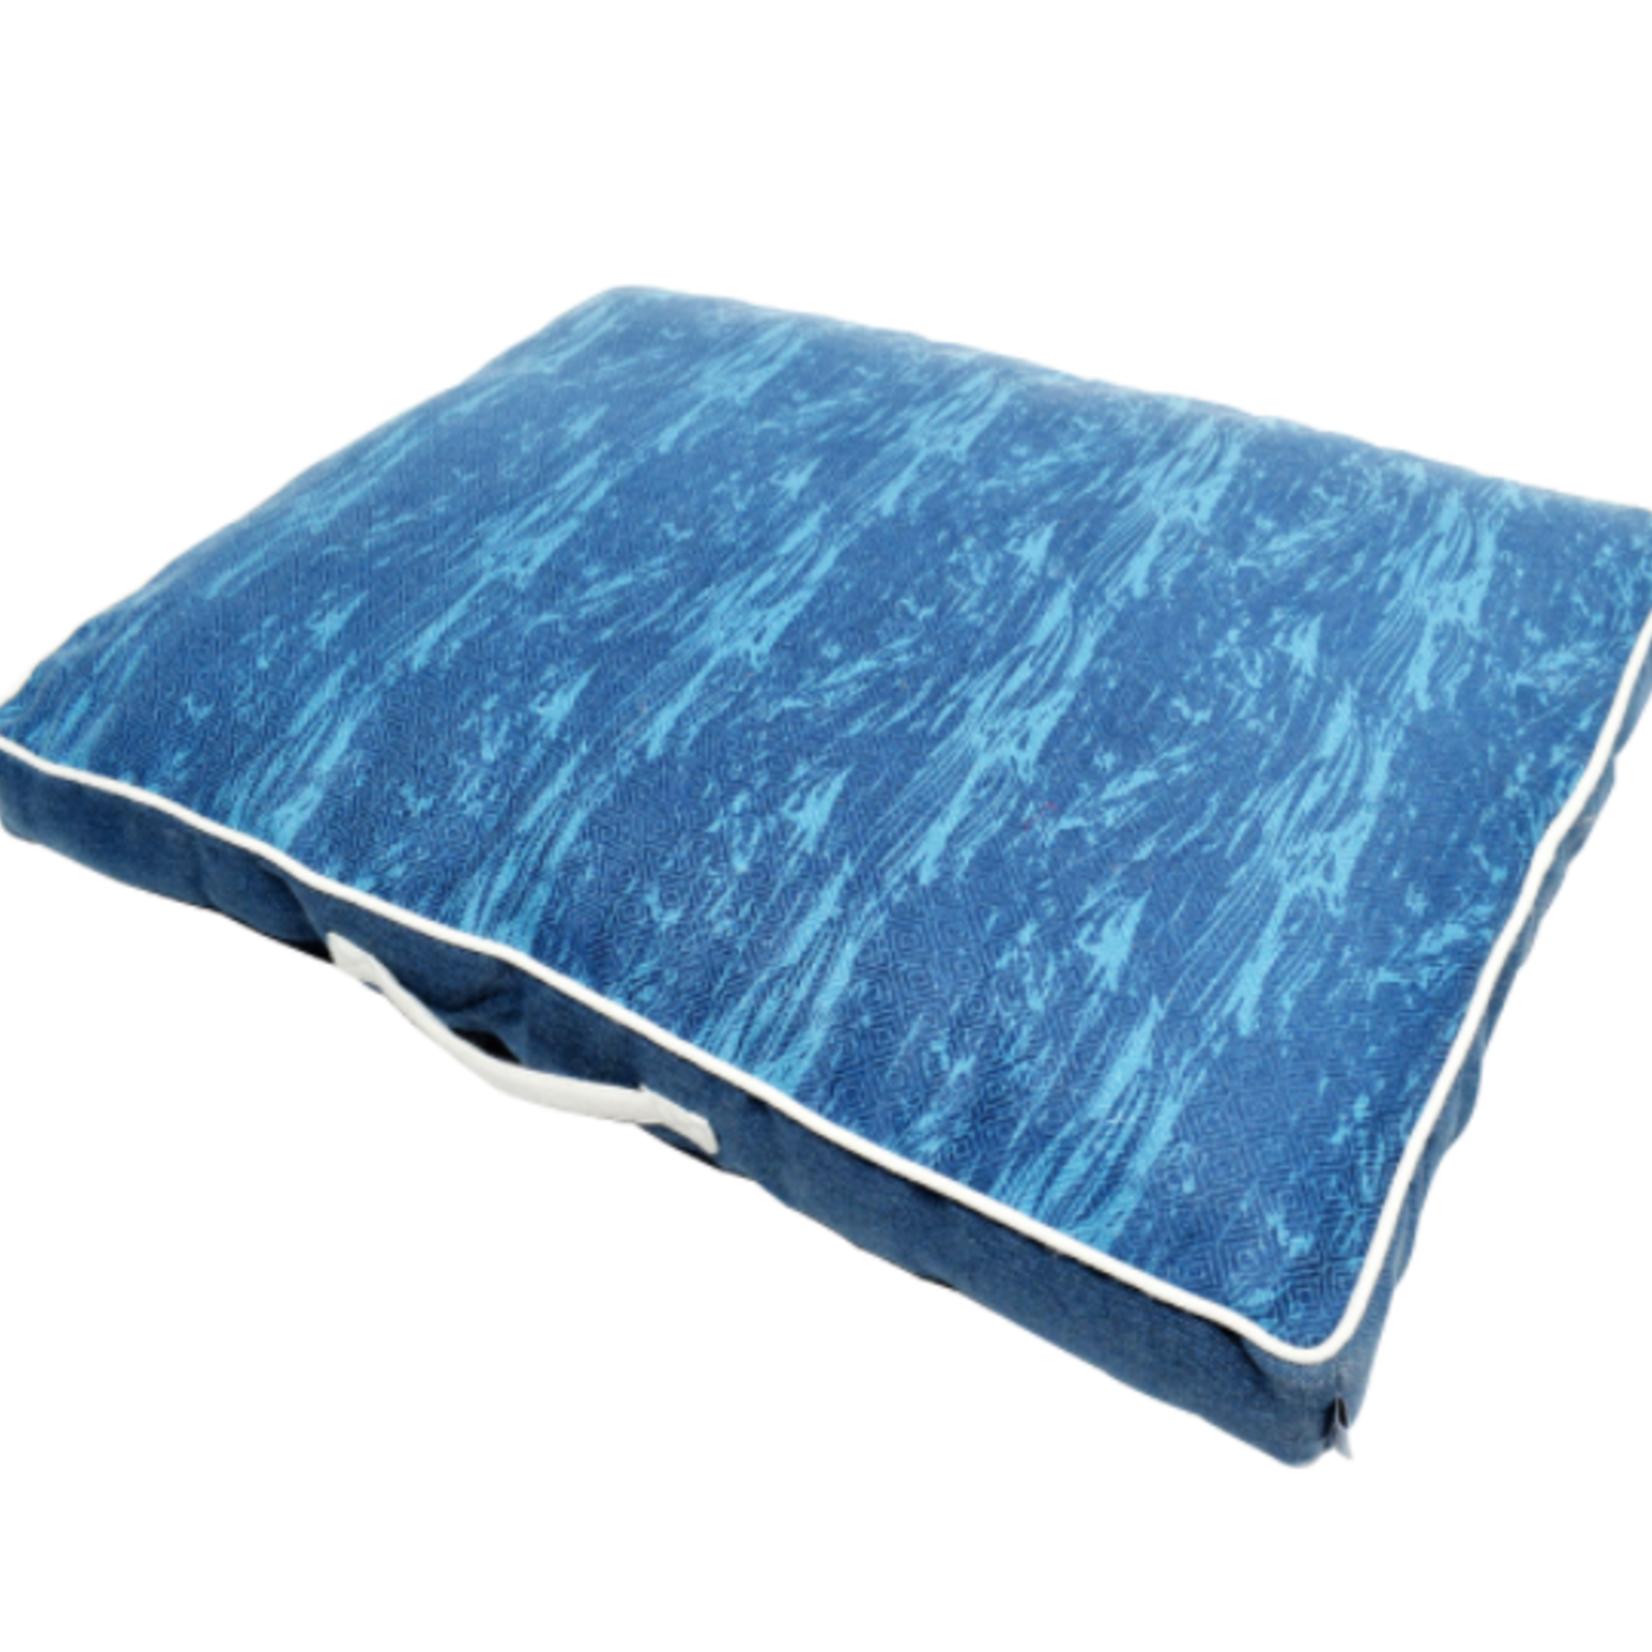 Resploot Matelas - Rectangulaire - Ocean profond - 80 x 60 x 8 cm